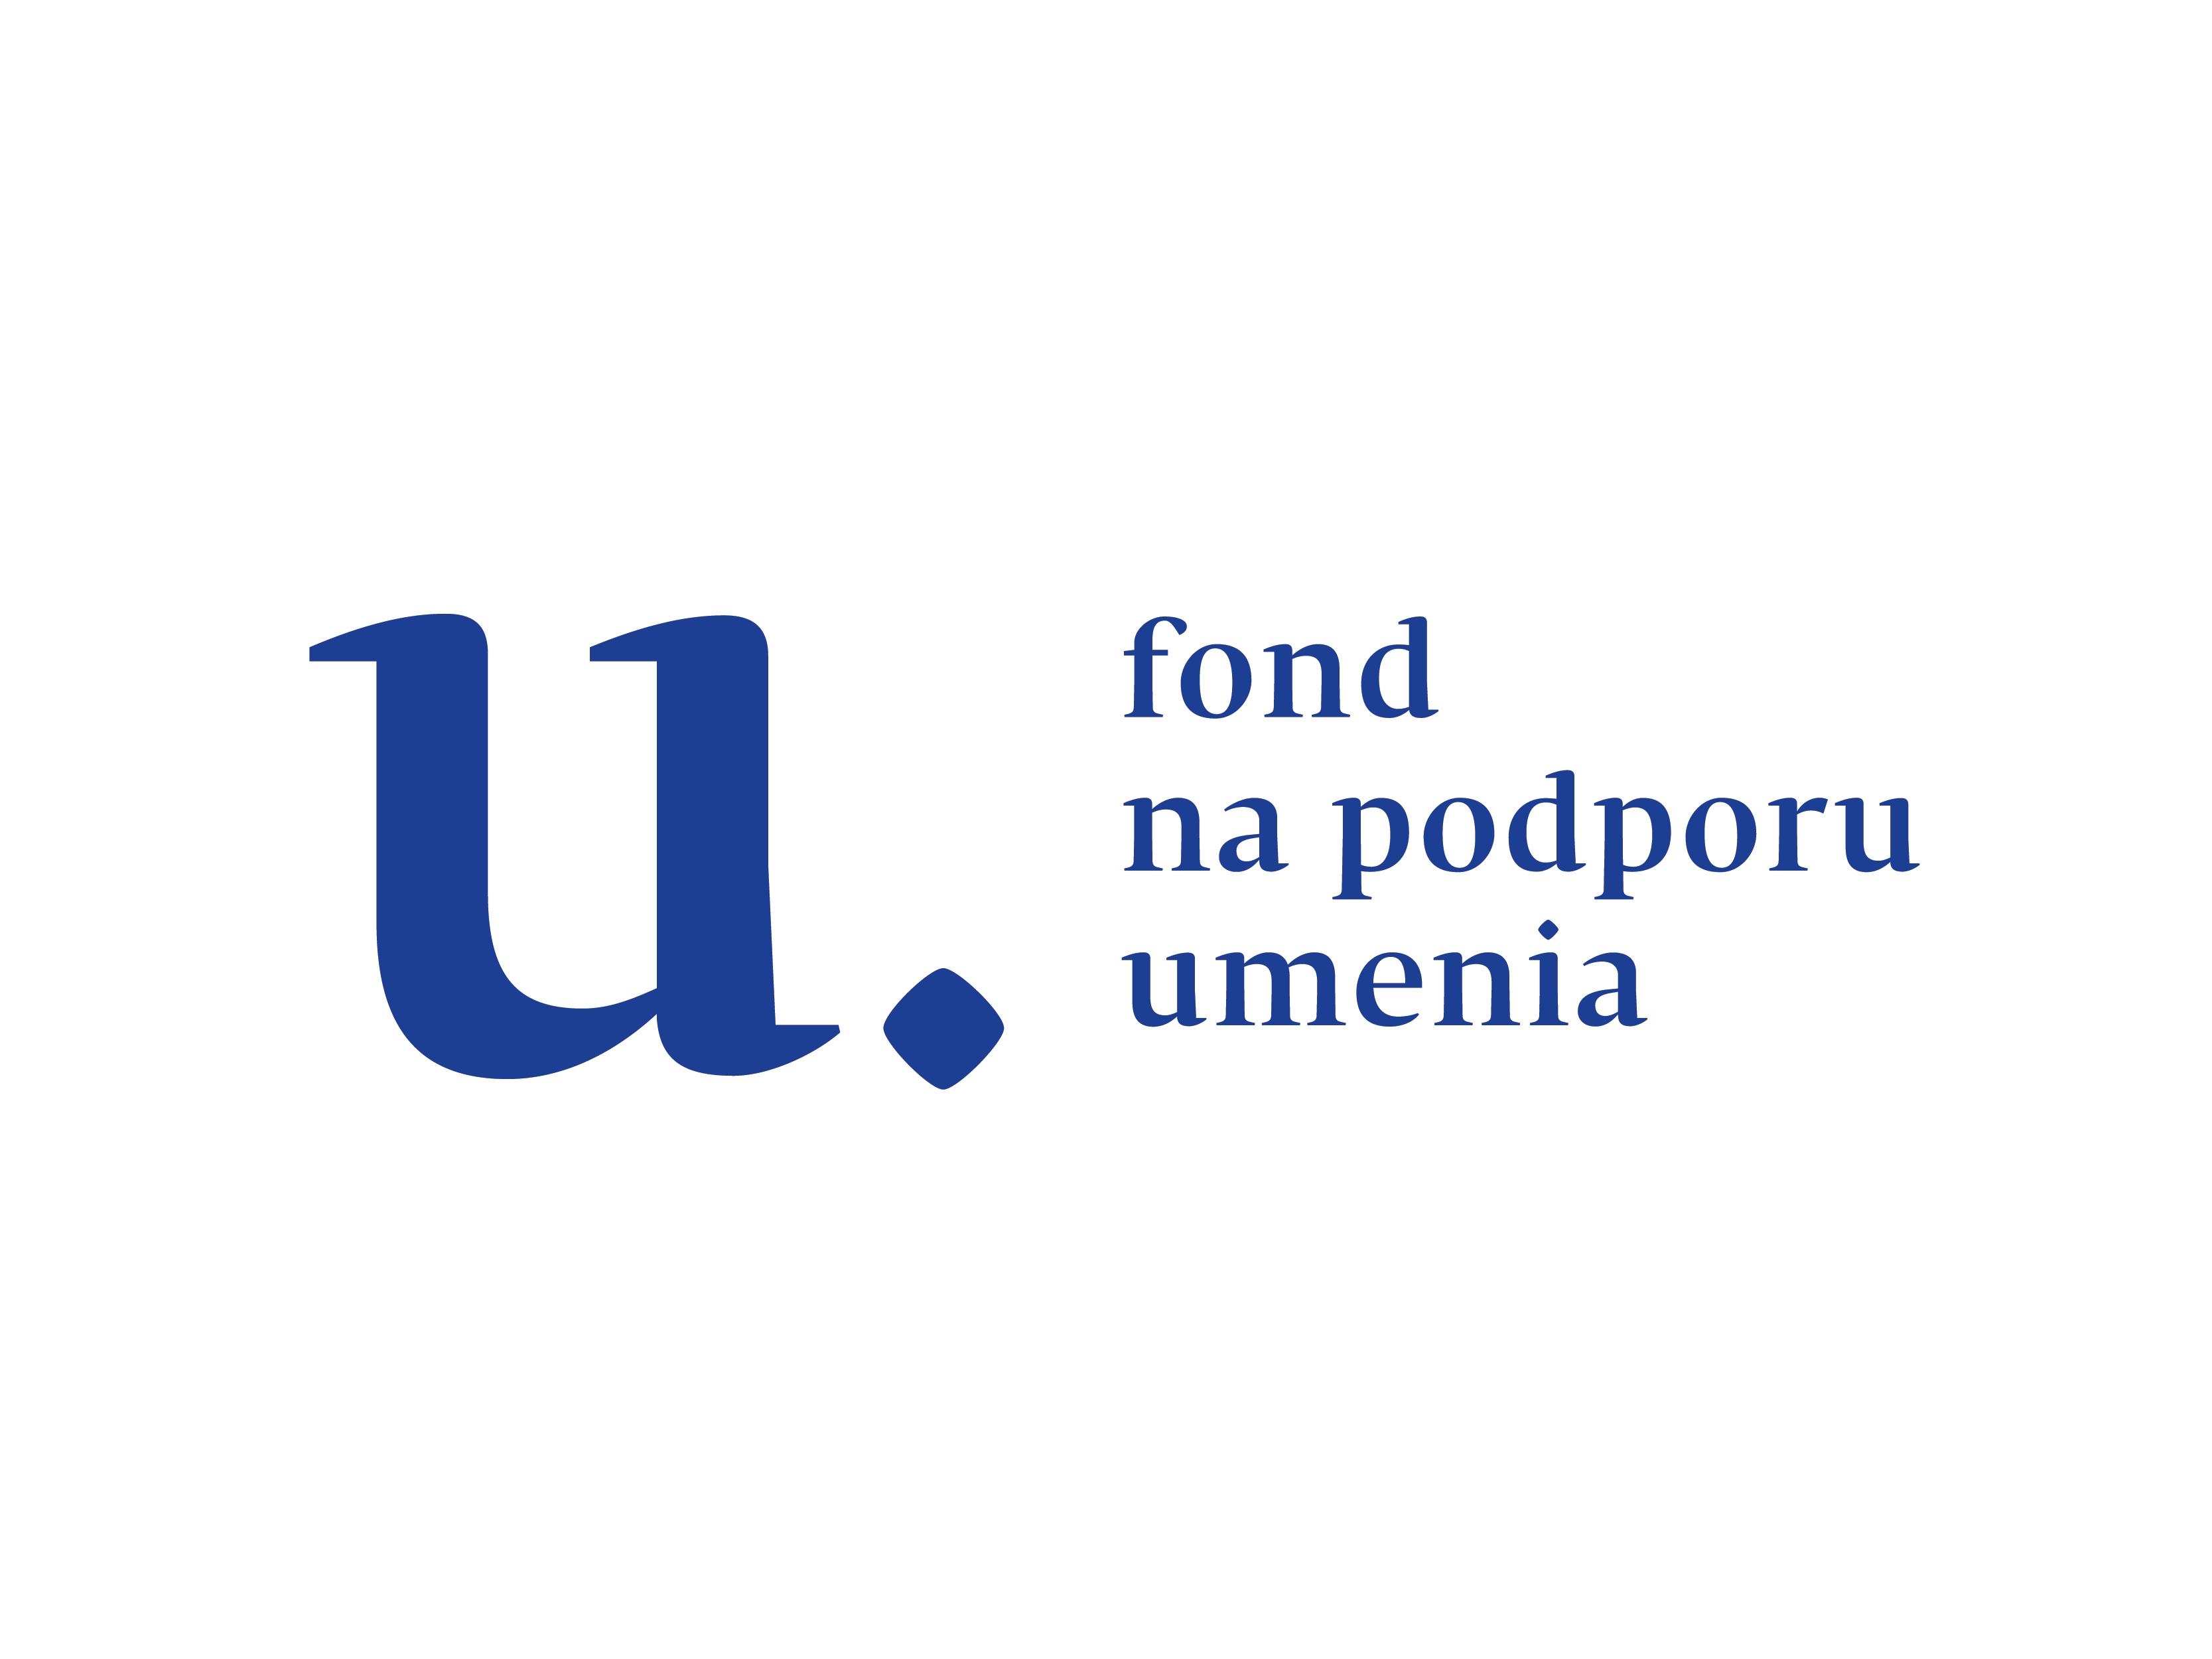 https://www.kniznicapetrzalka.sk/wp-content/uploads/2018/03/FPU_logo1_modre.jpg